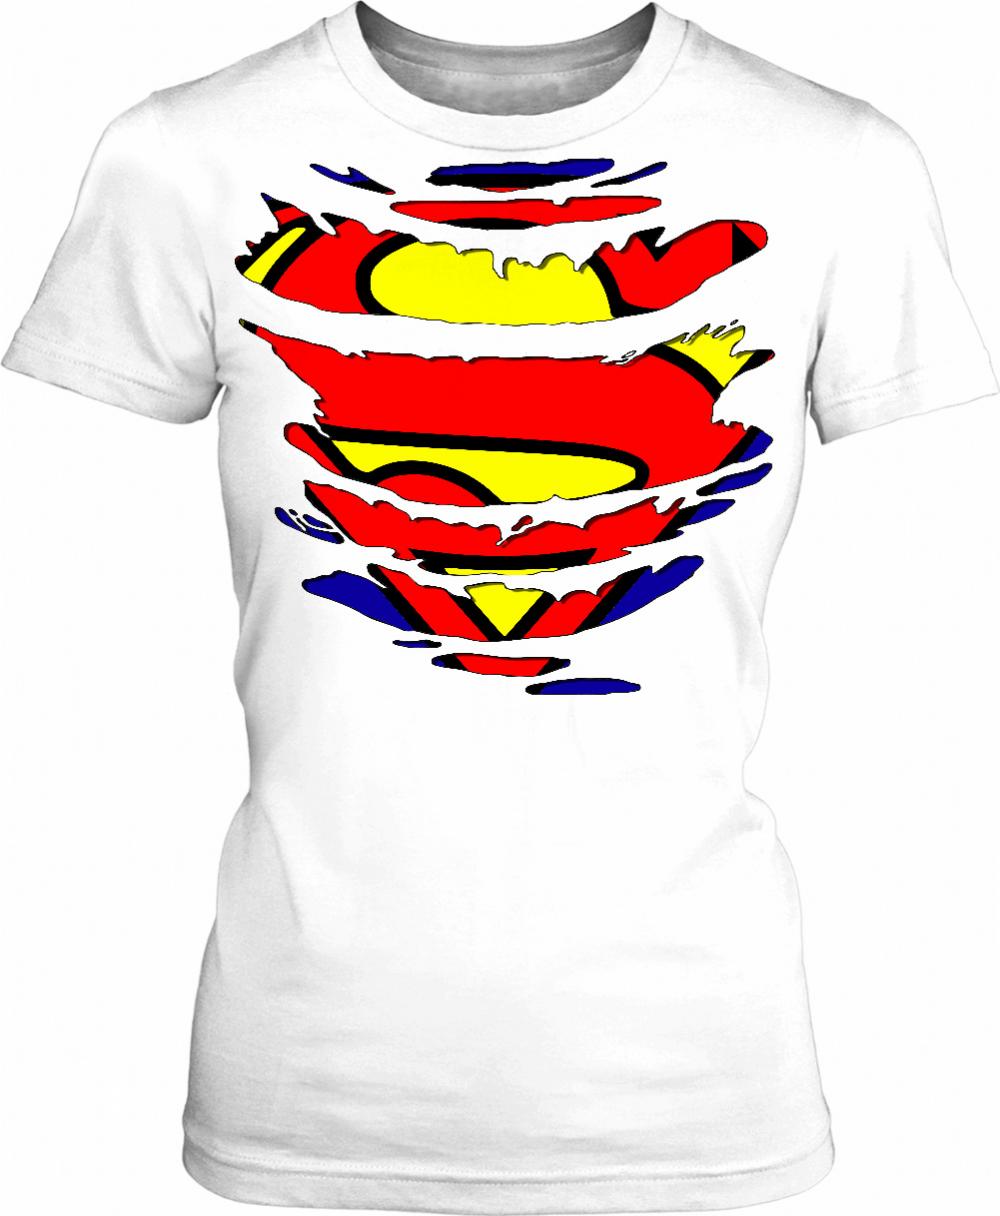 superhero girl in disguise torn